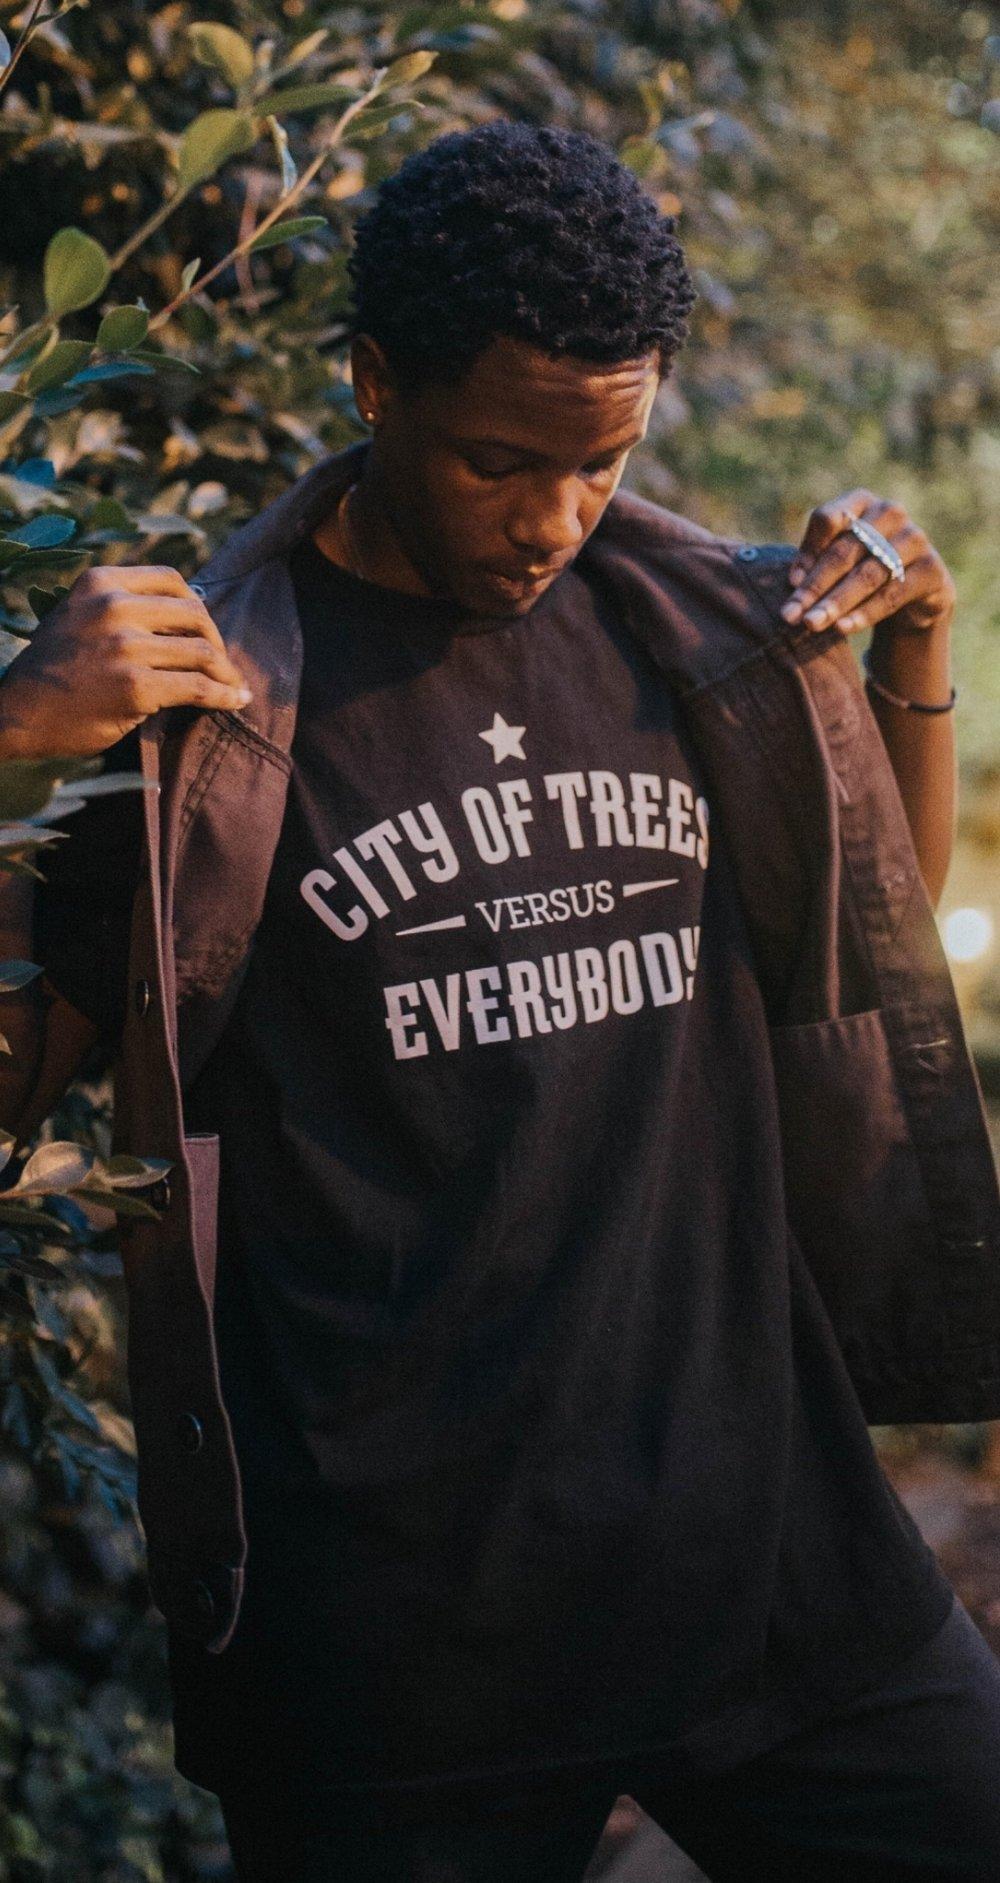 City of Trees Versus Everybody                 Black T-Shirt